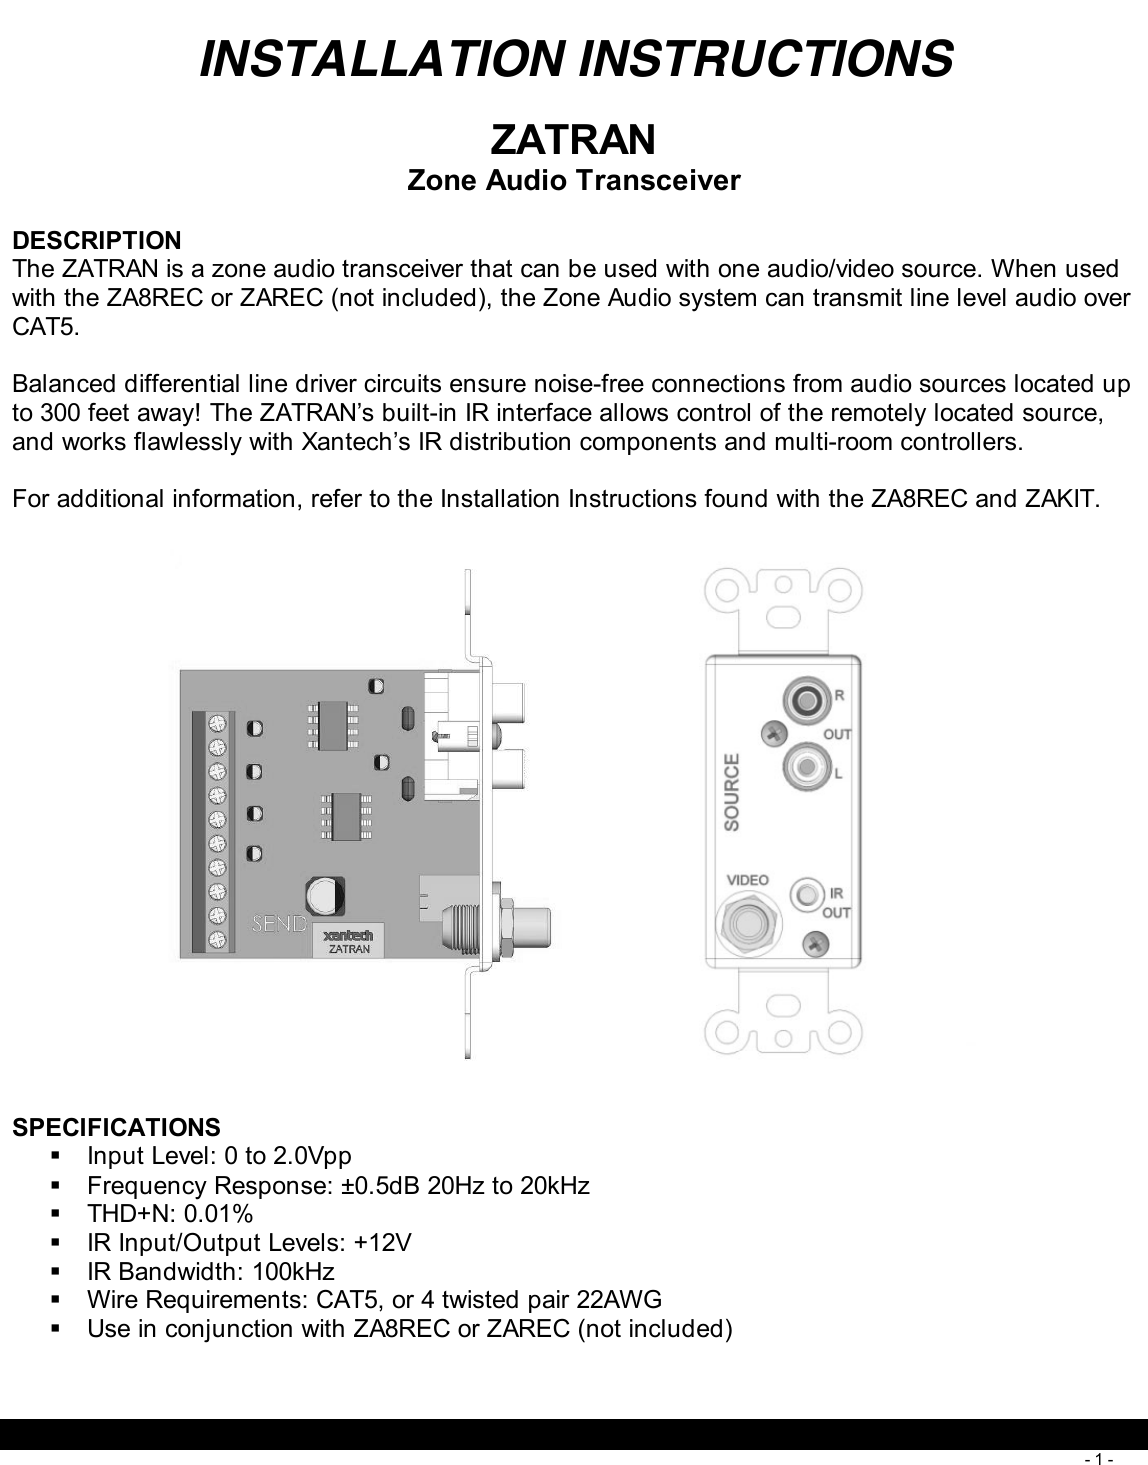 256 I Zatran 08901682x3 User Manual Cat5 Wiring Diagram Wiki